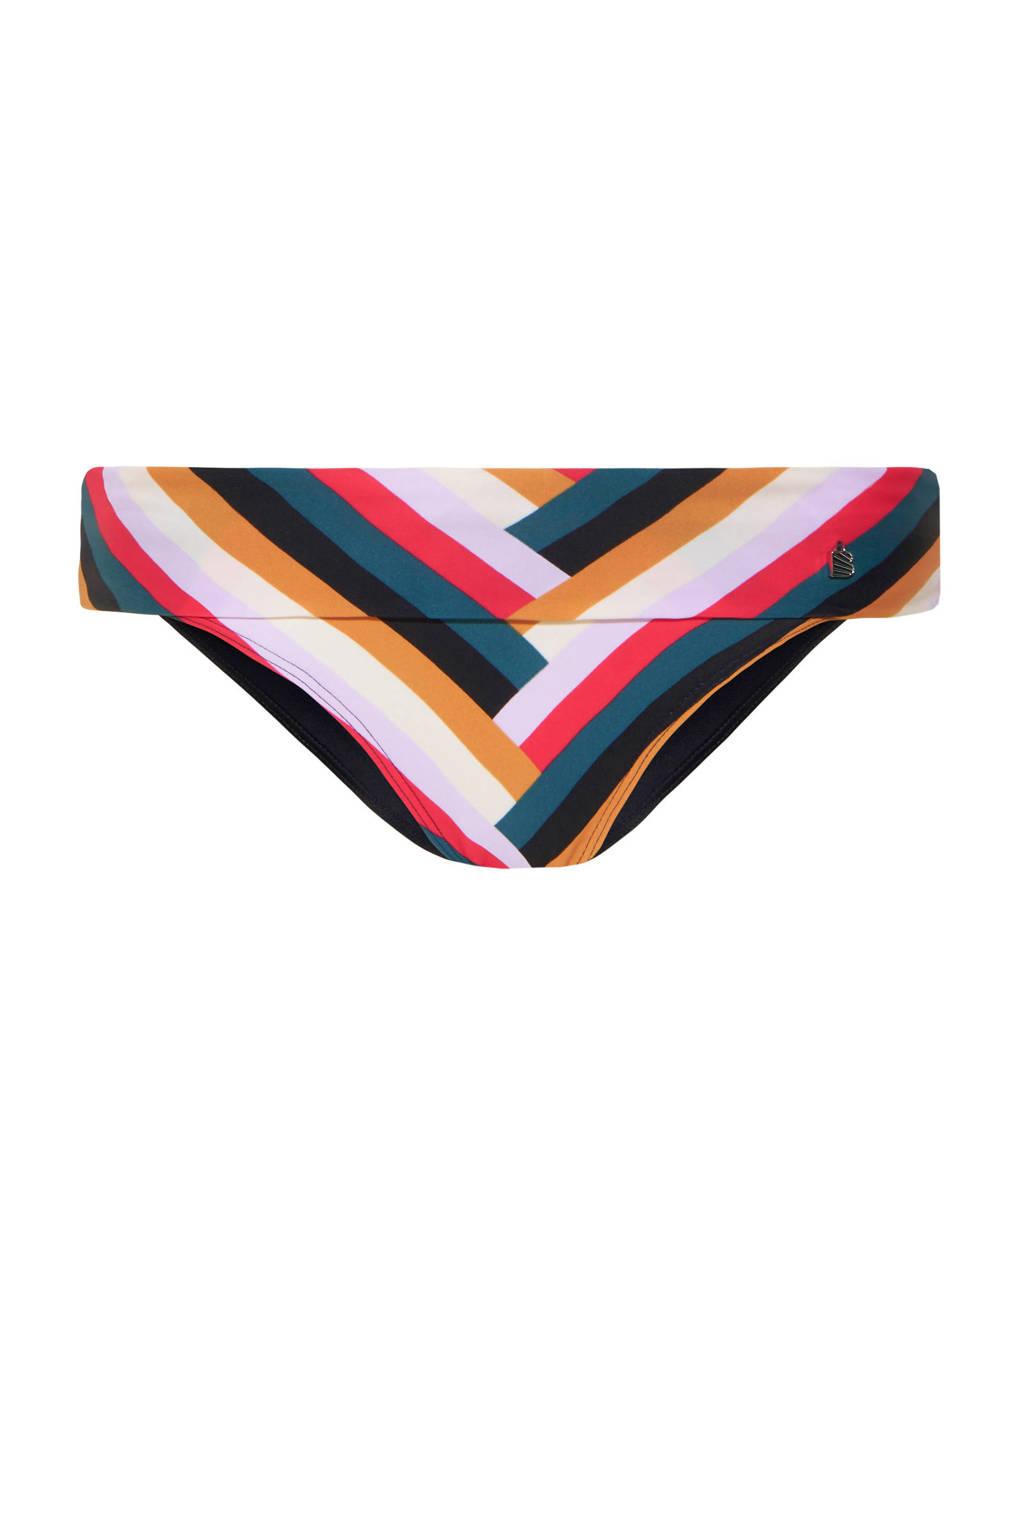 Beachlife gestreept omslag bikinibroekje donkerblauw/roze, Donkerblauw/wit/roze/lila/petrol/camel